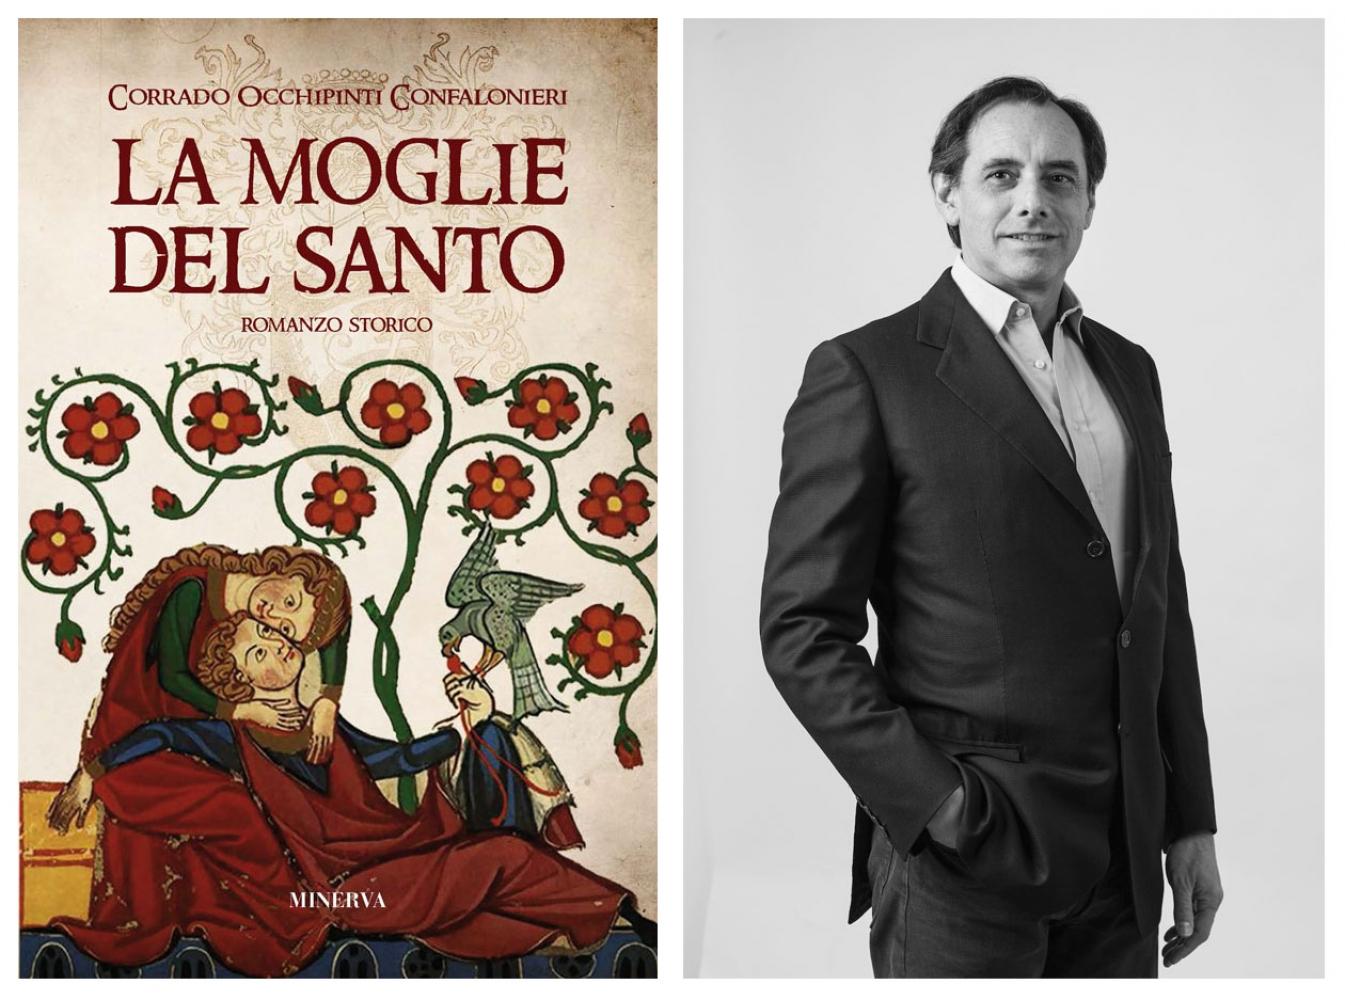 Meeting with Corrado Occhipinti Confalioneri introducing his romance La moglie del santo